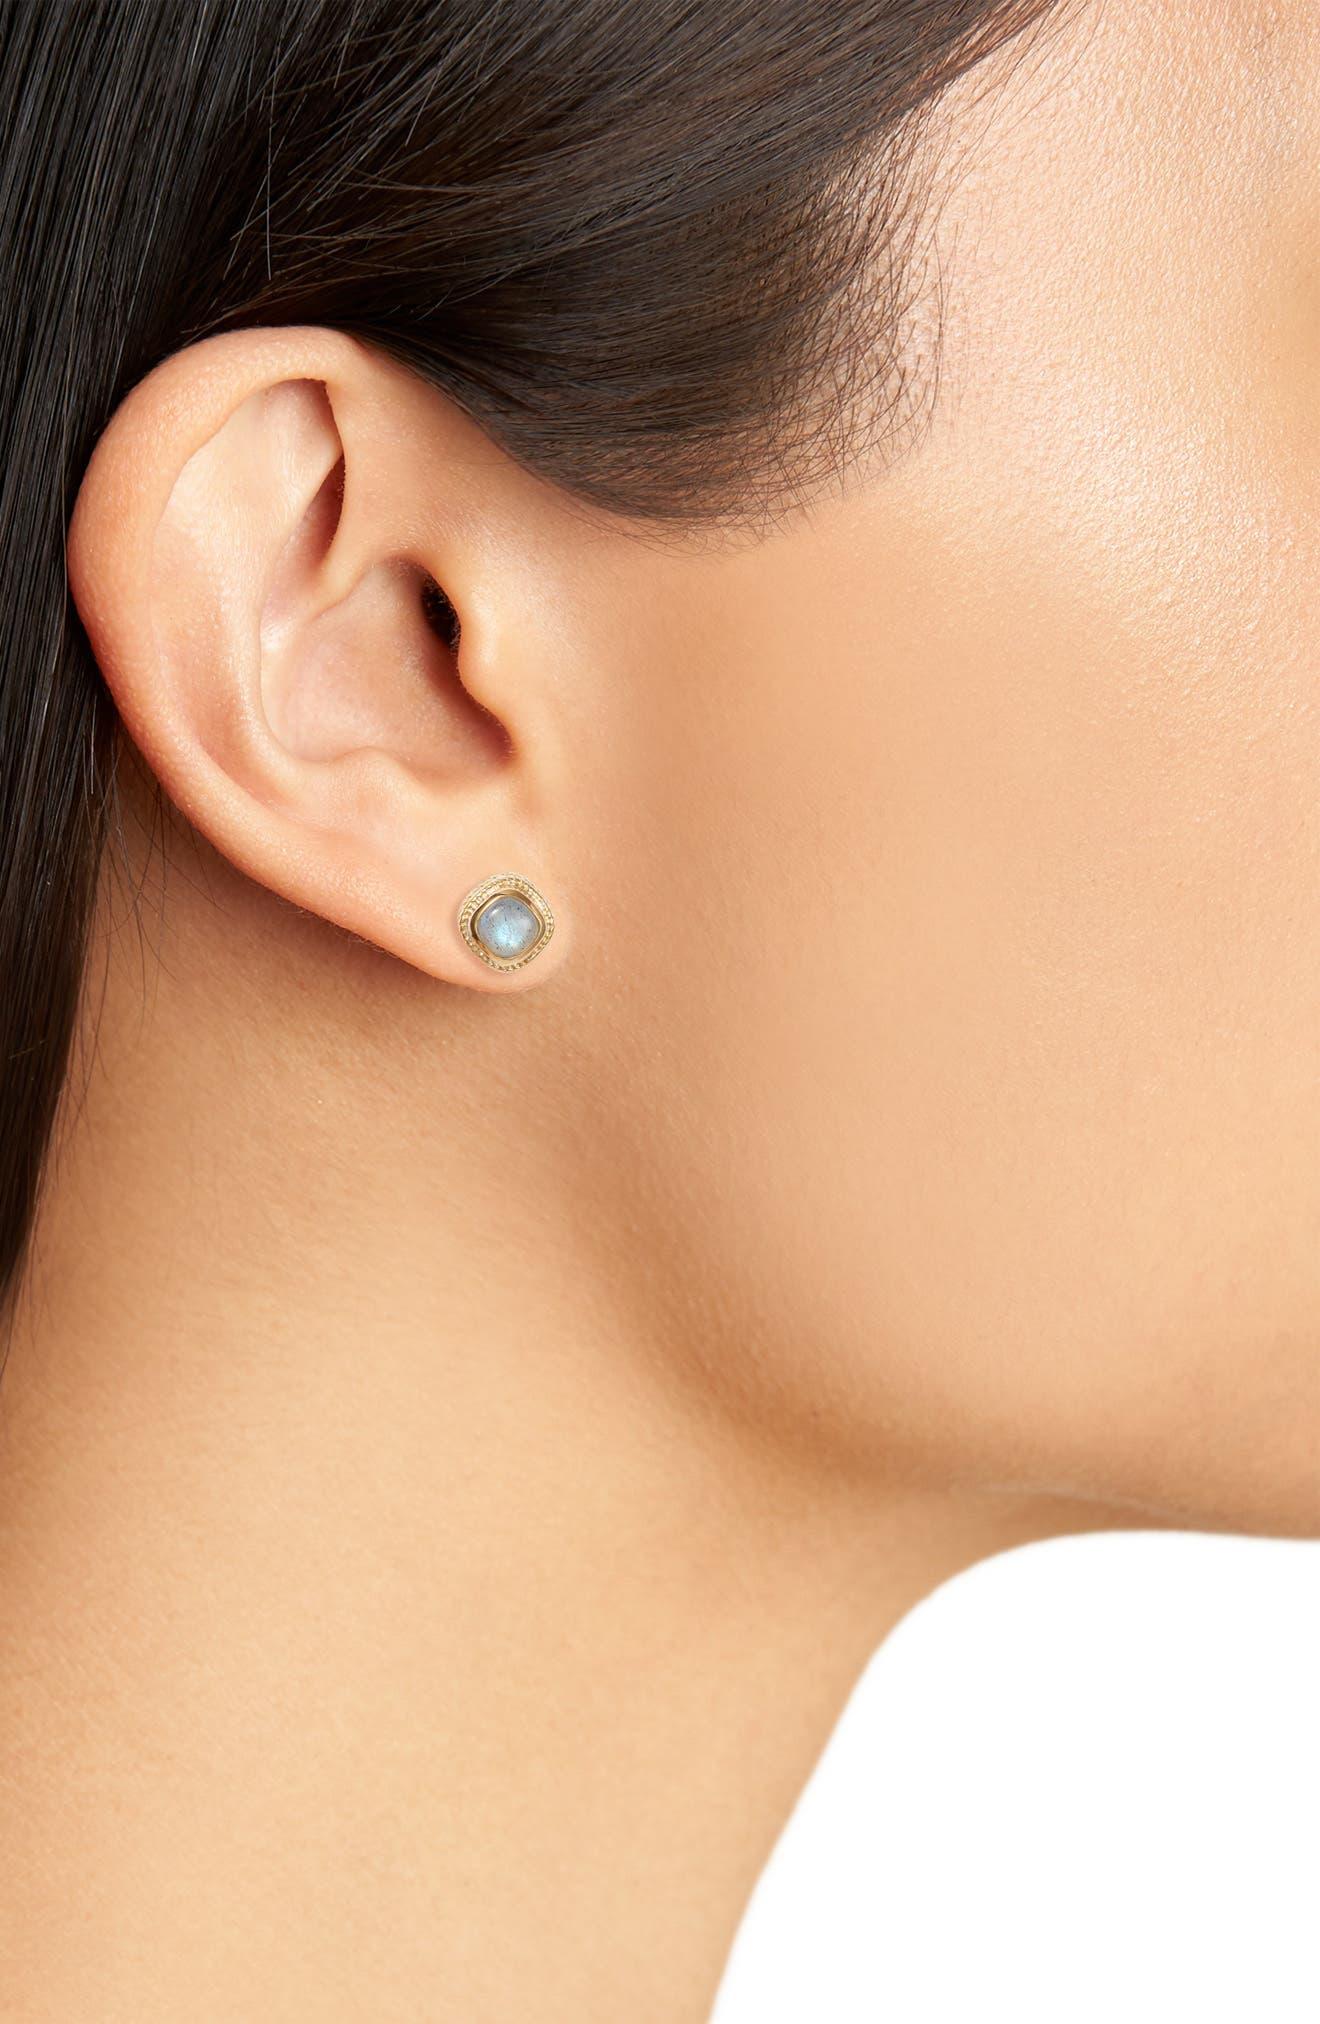 Semiprecious Stone Cushion Stud Earrings,                             Alternate thumbnail 2, color,                             GOLD/ LABRADORITE